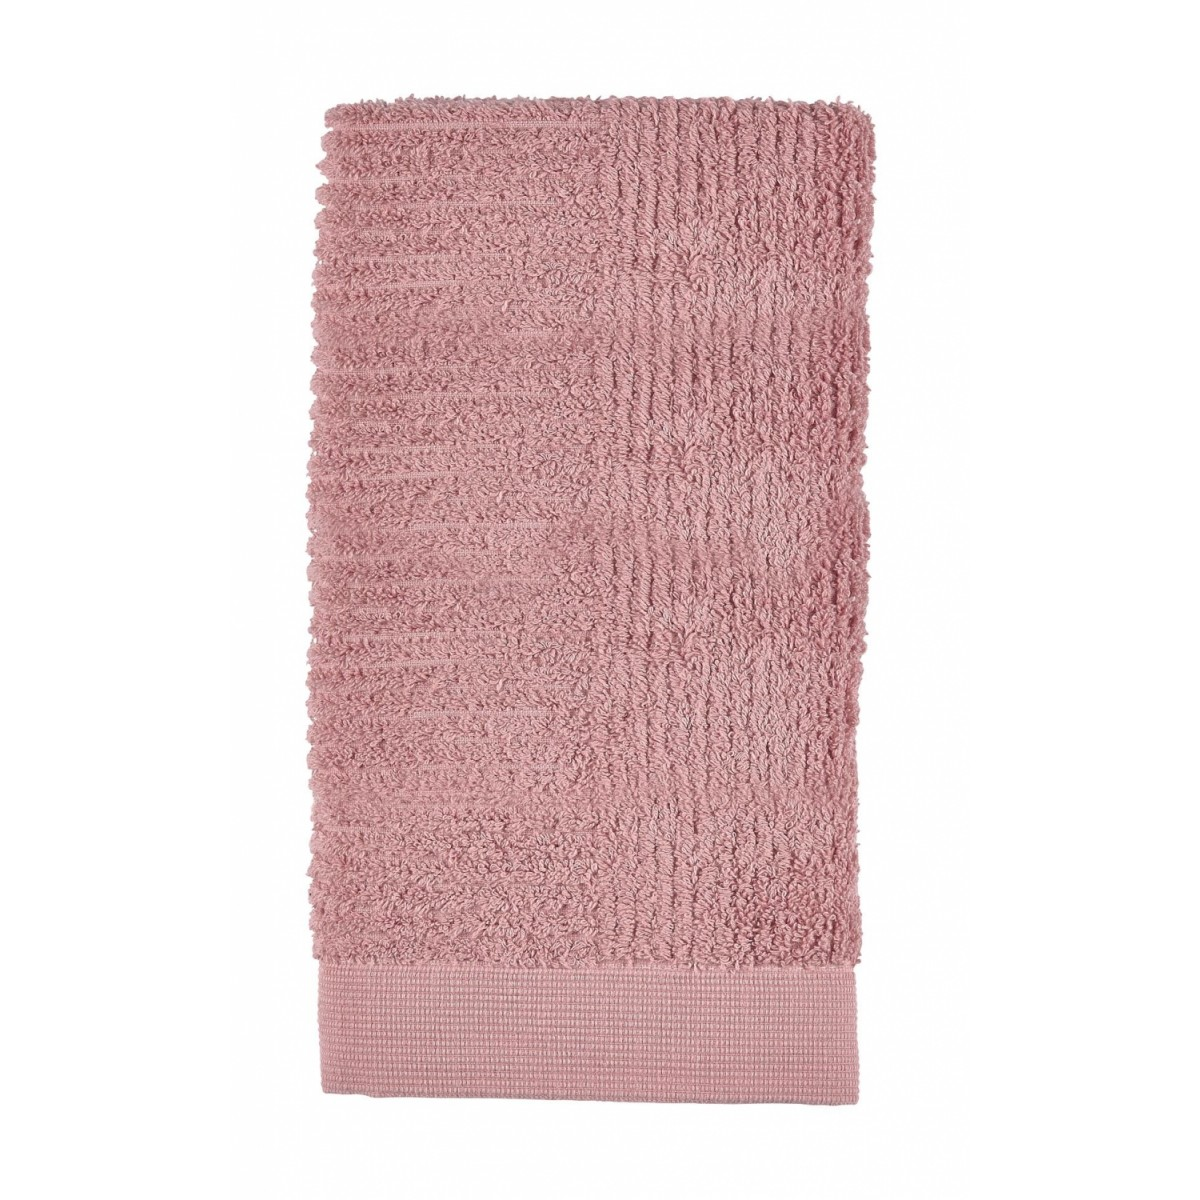 ZONE Classic håndklæde 50 x 100 cm. rosa